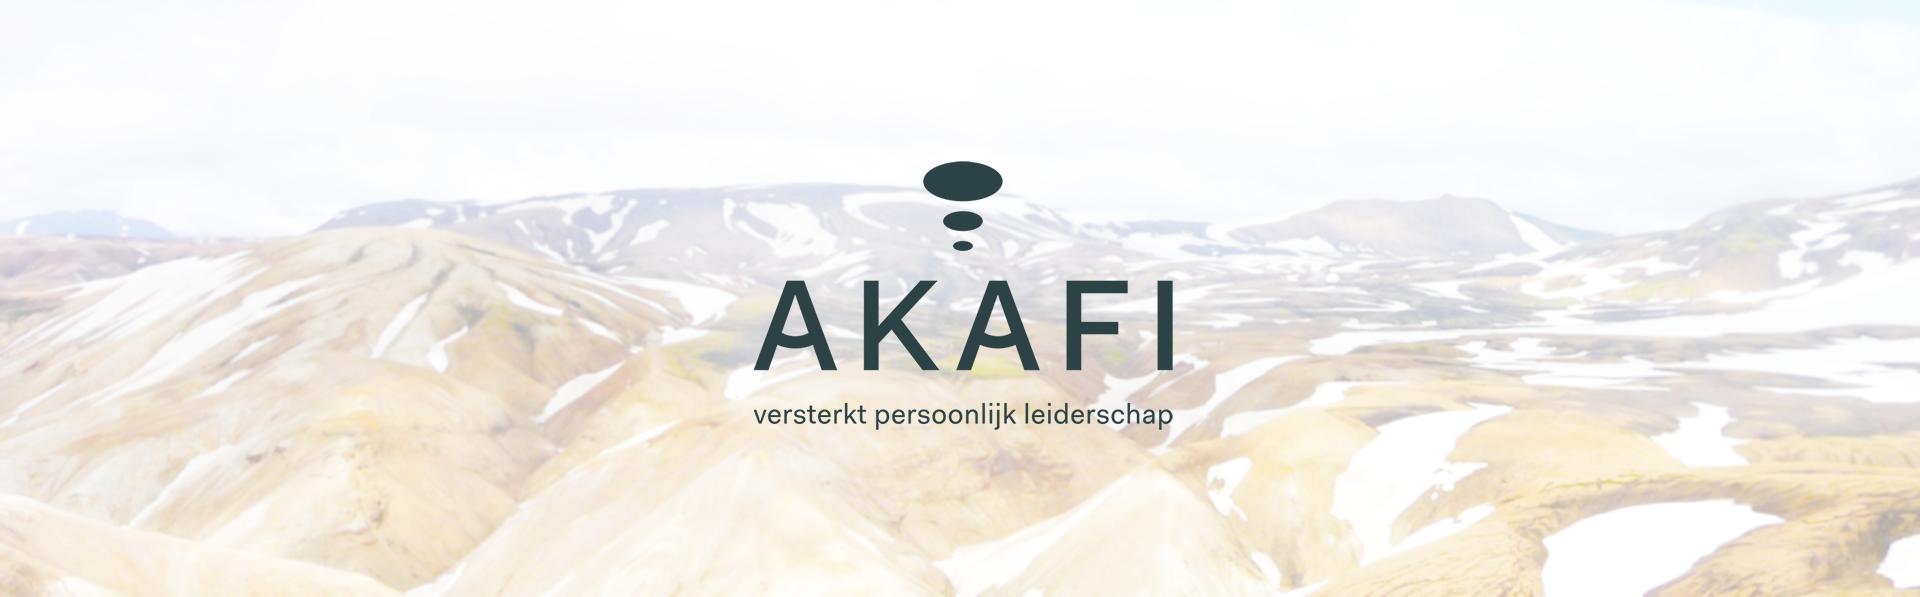 www.AKAFI.nl